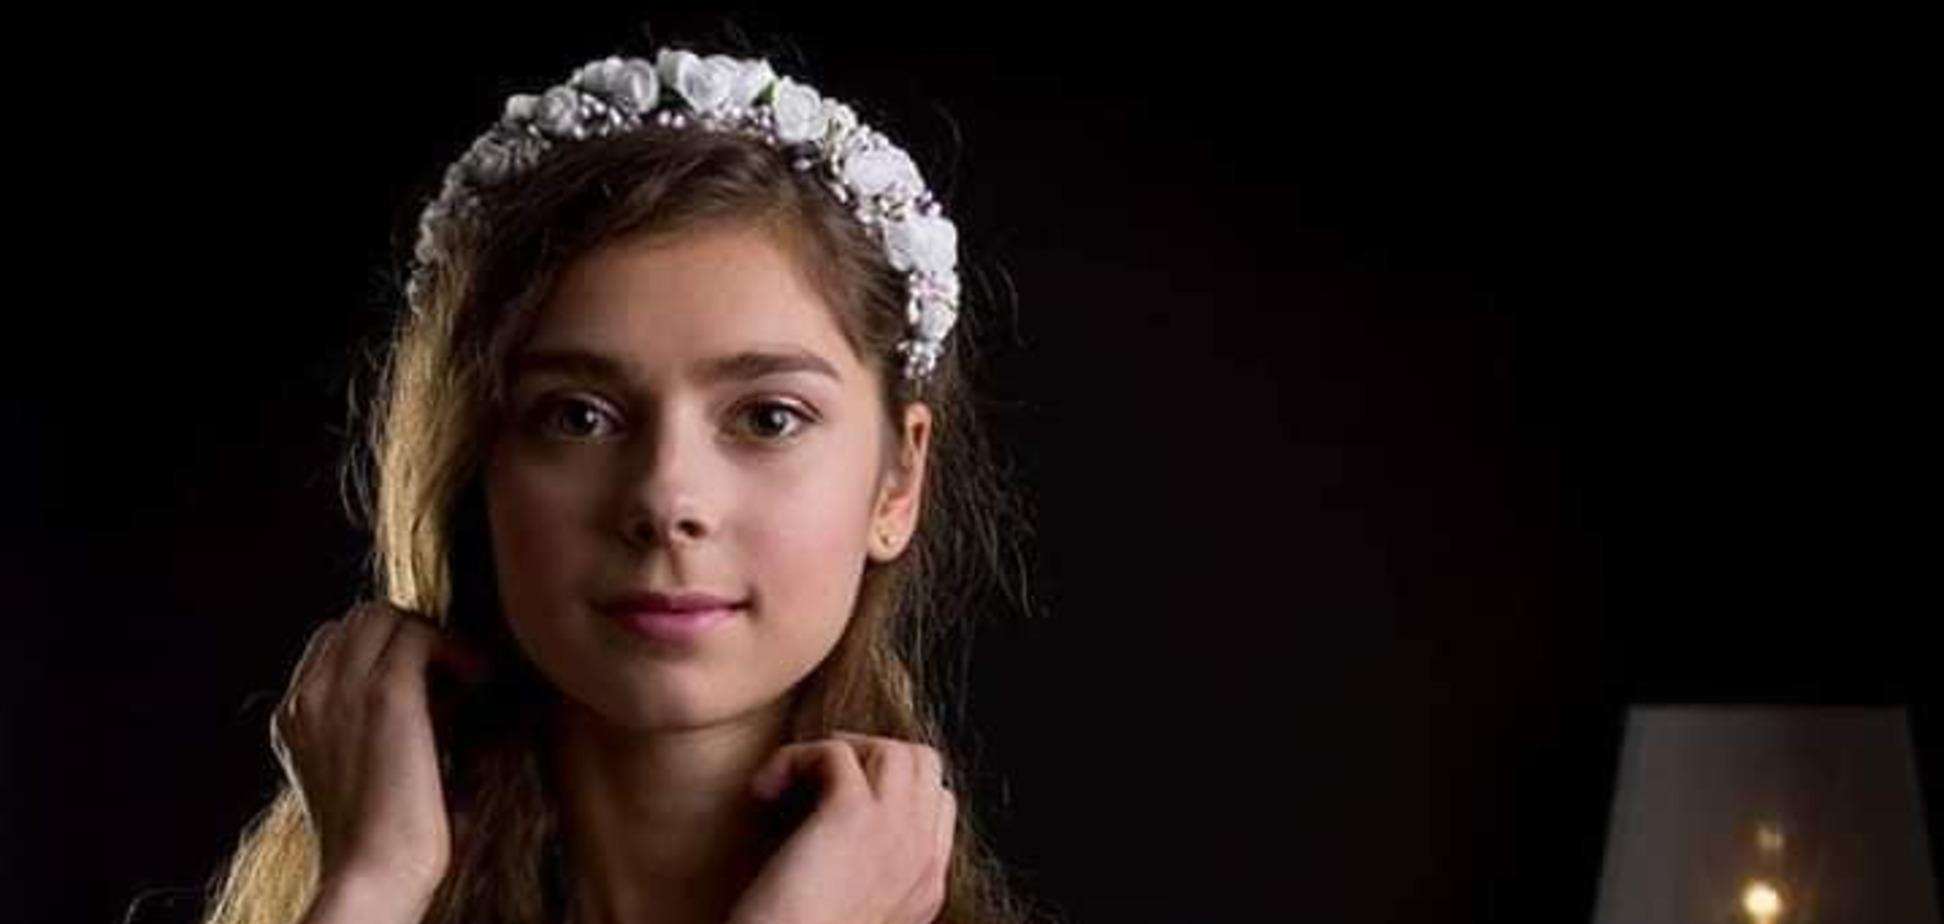 Раптово померла юна українська поетеса Інелла Огнєва